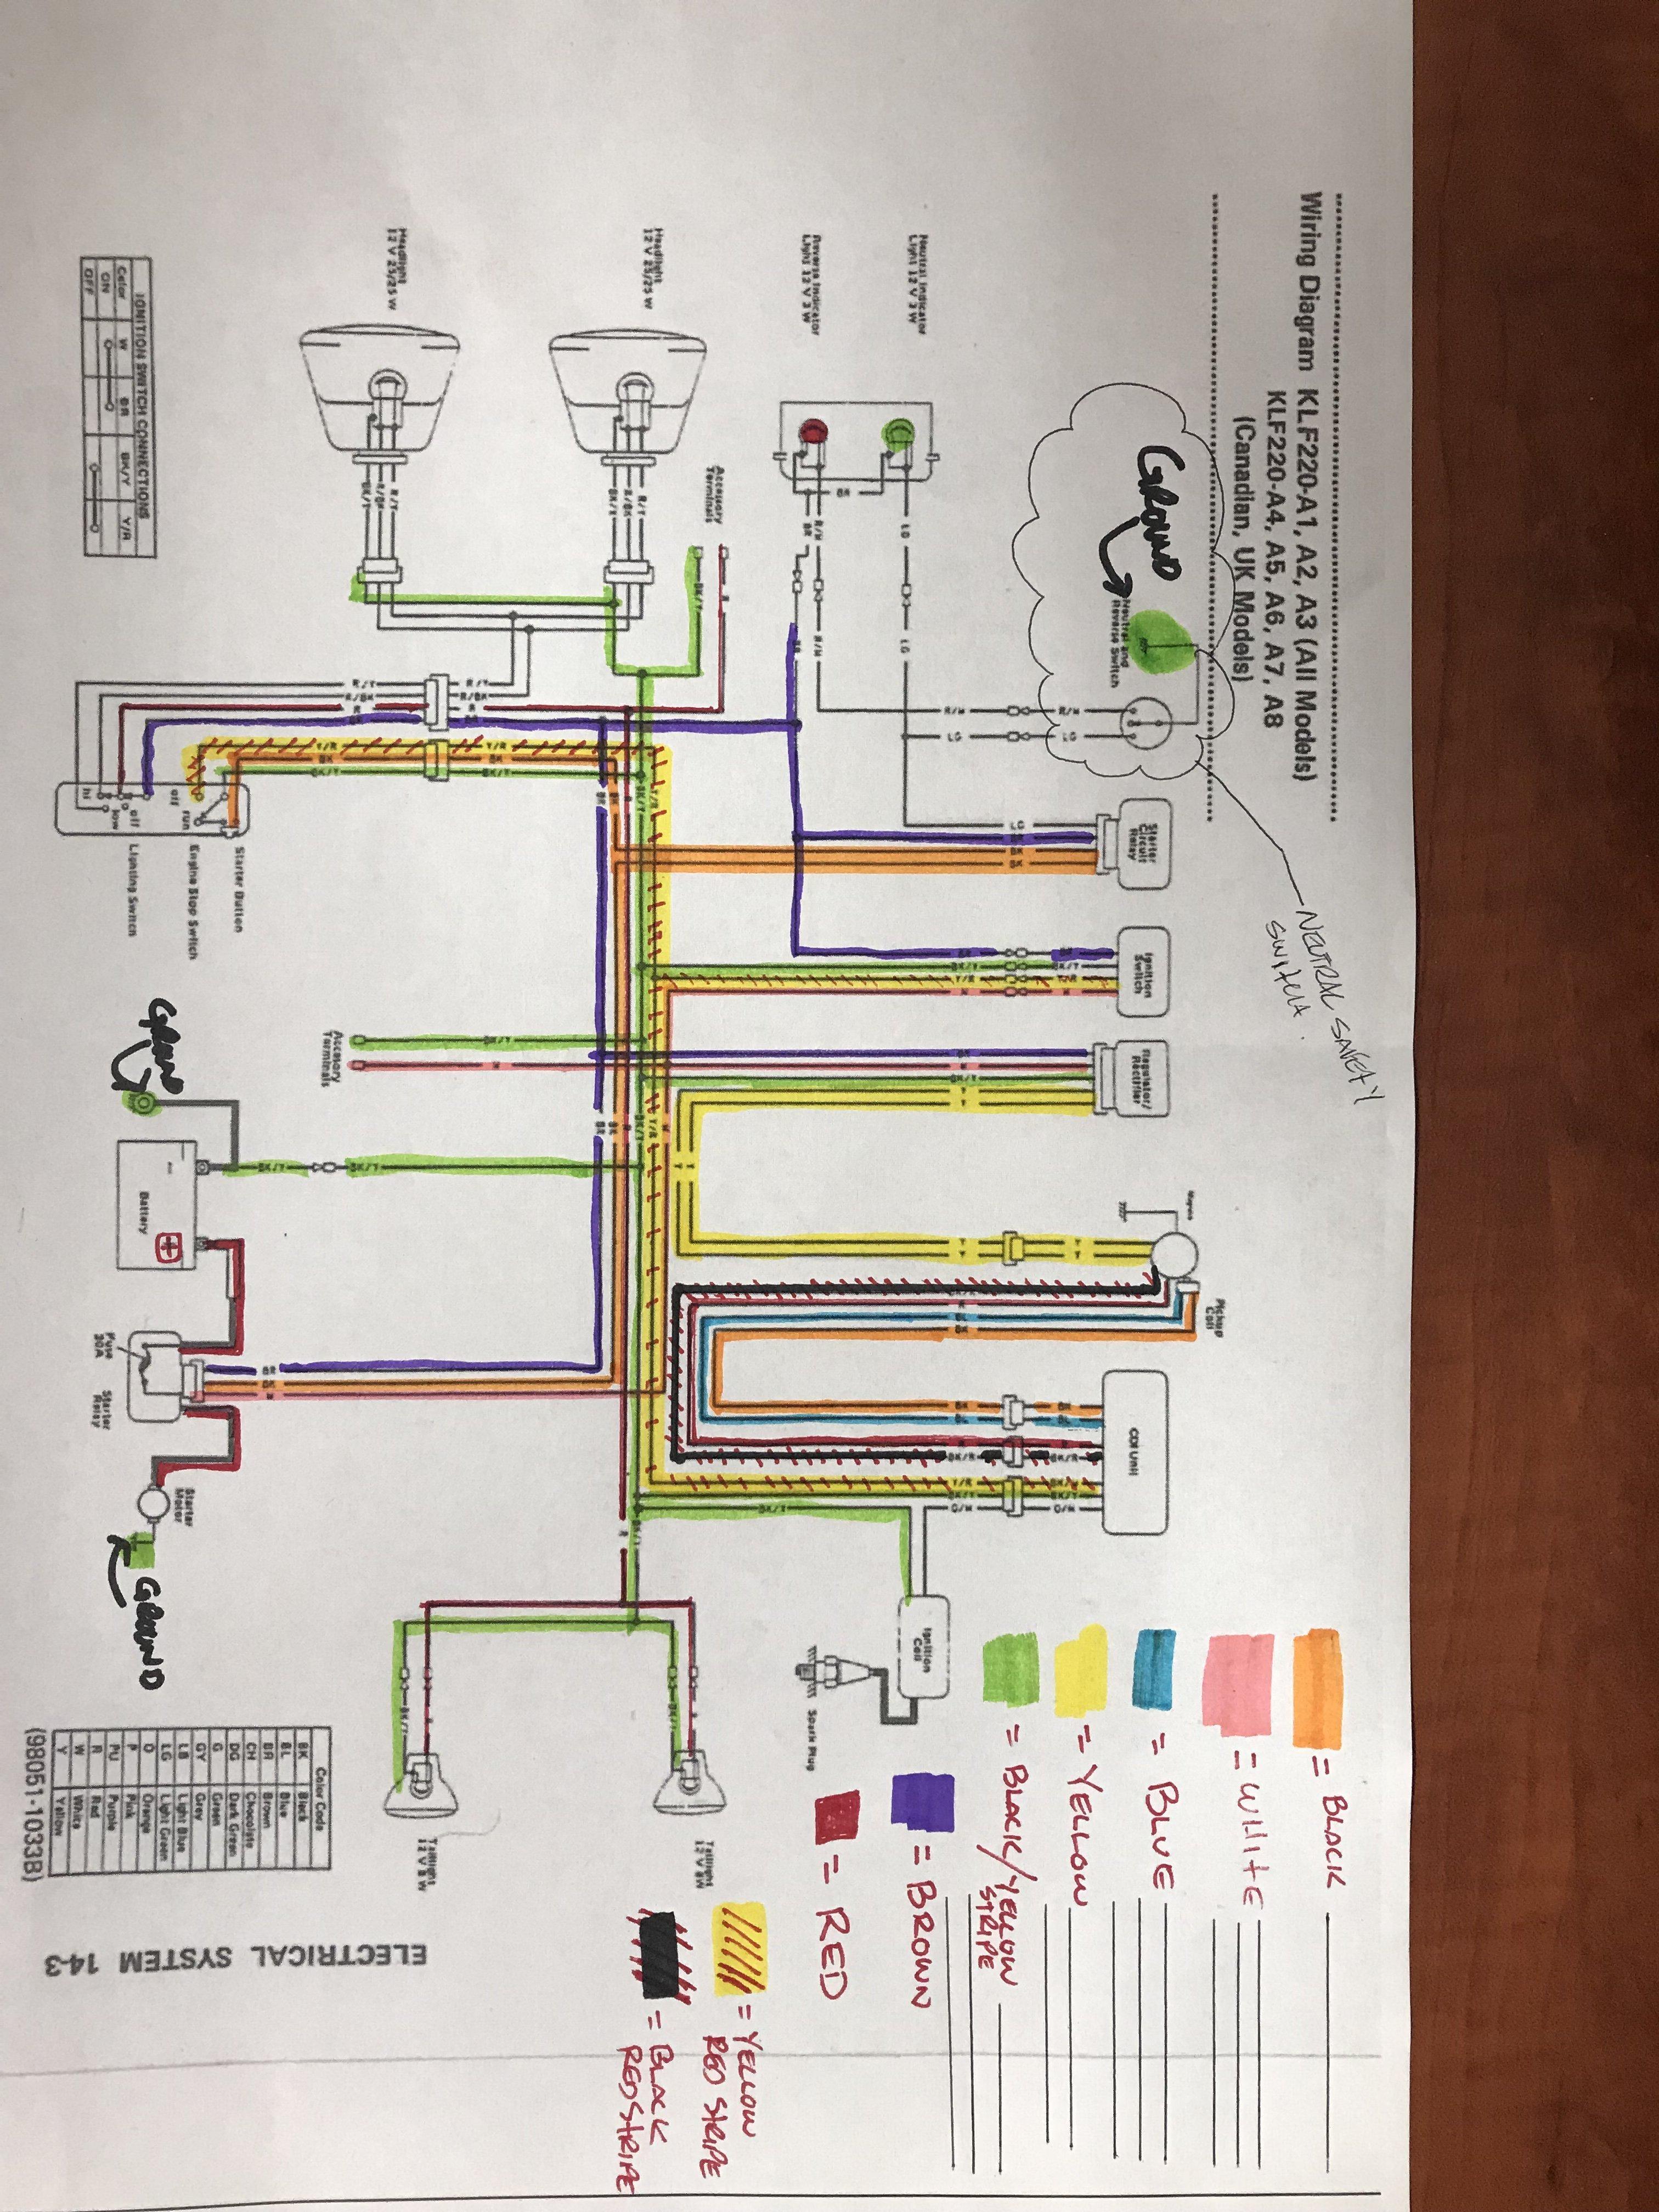 Kawasaki Bayou 300 Wiring Harness - Wiring Diagram Models versed-control -  versed-control.zeevaproduction.it | Bayou 300 Wiring Diagram |  | versed-control.zeevaproduction.it